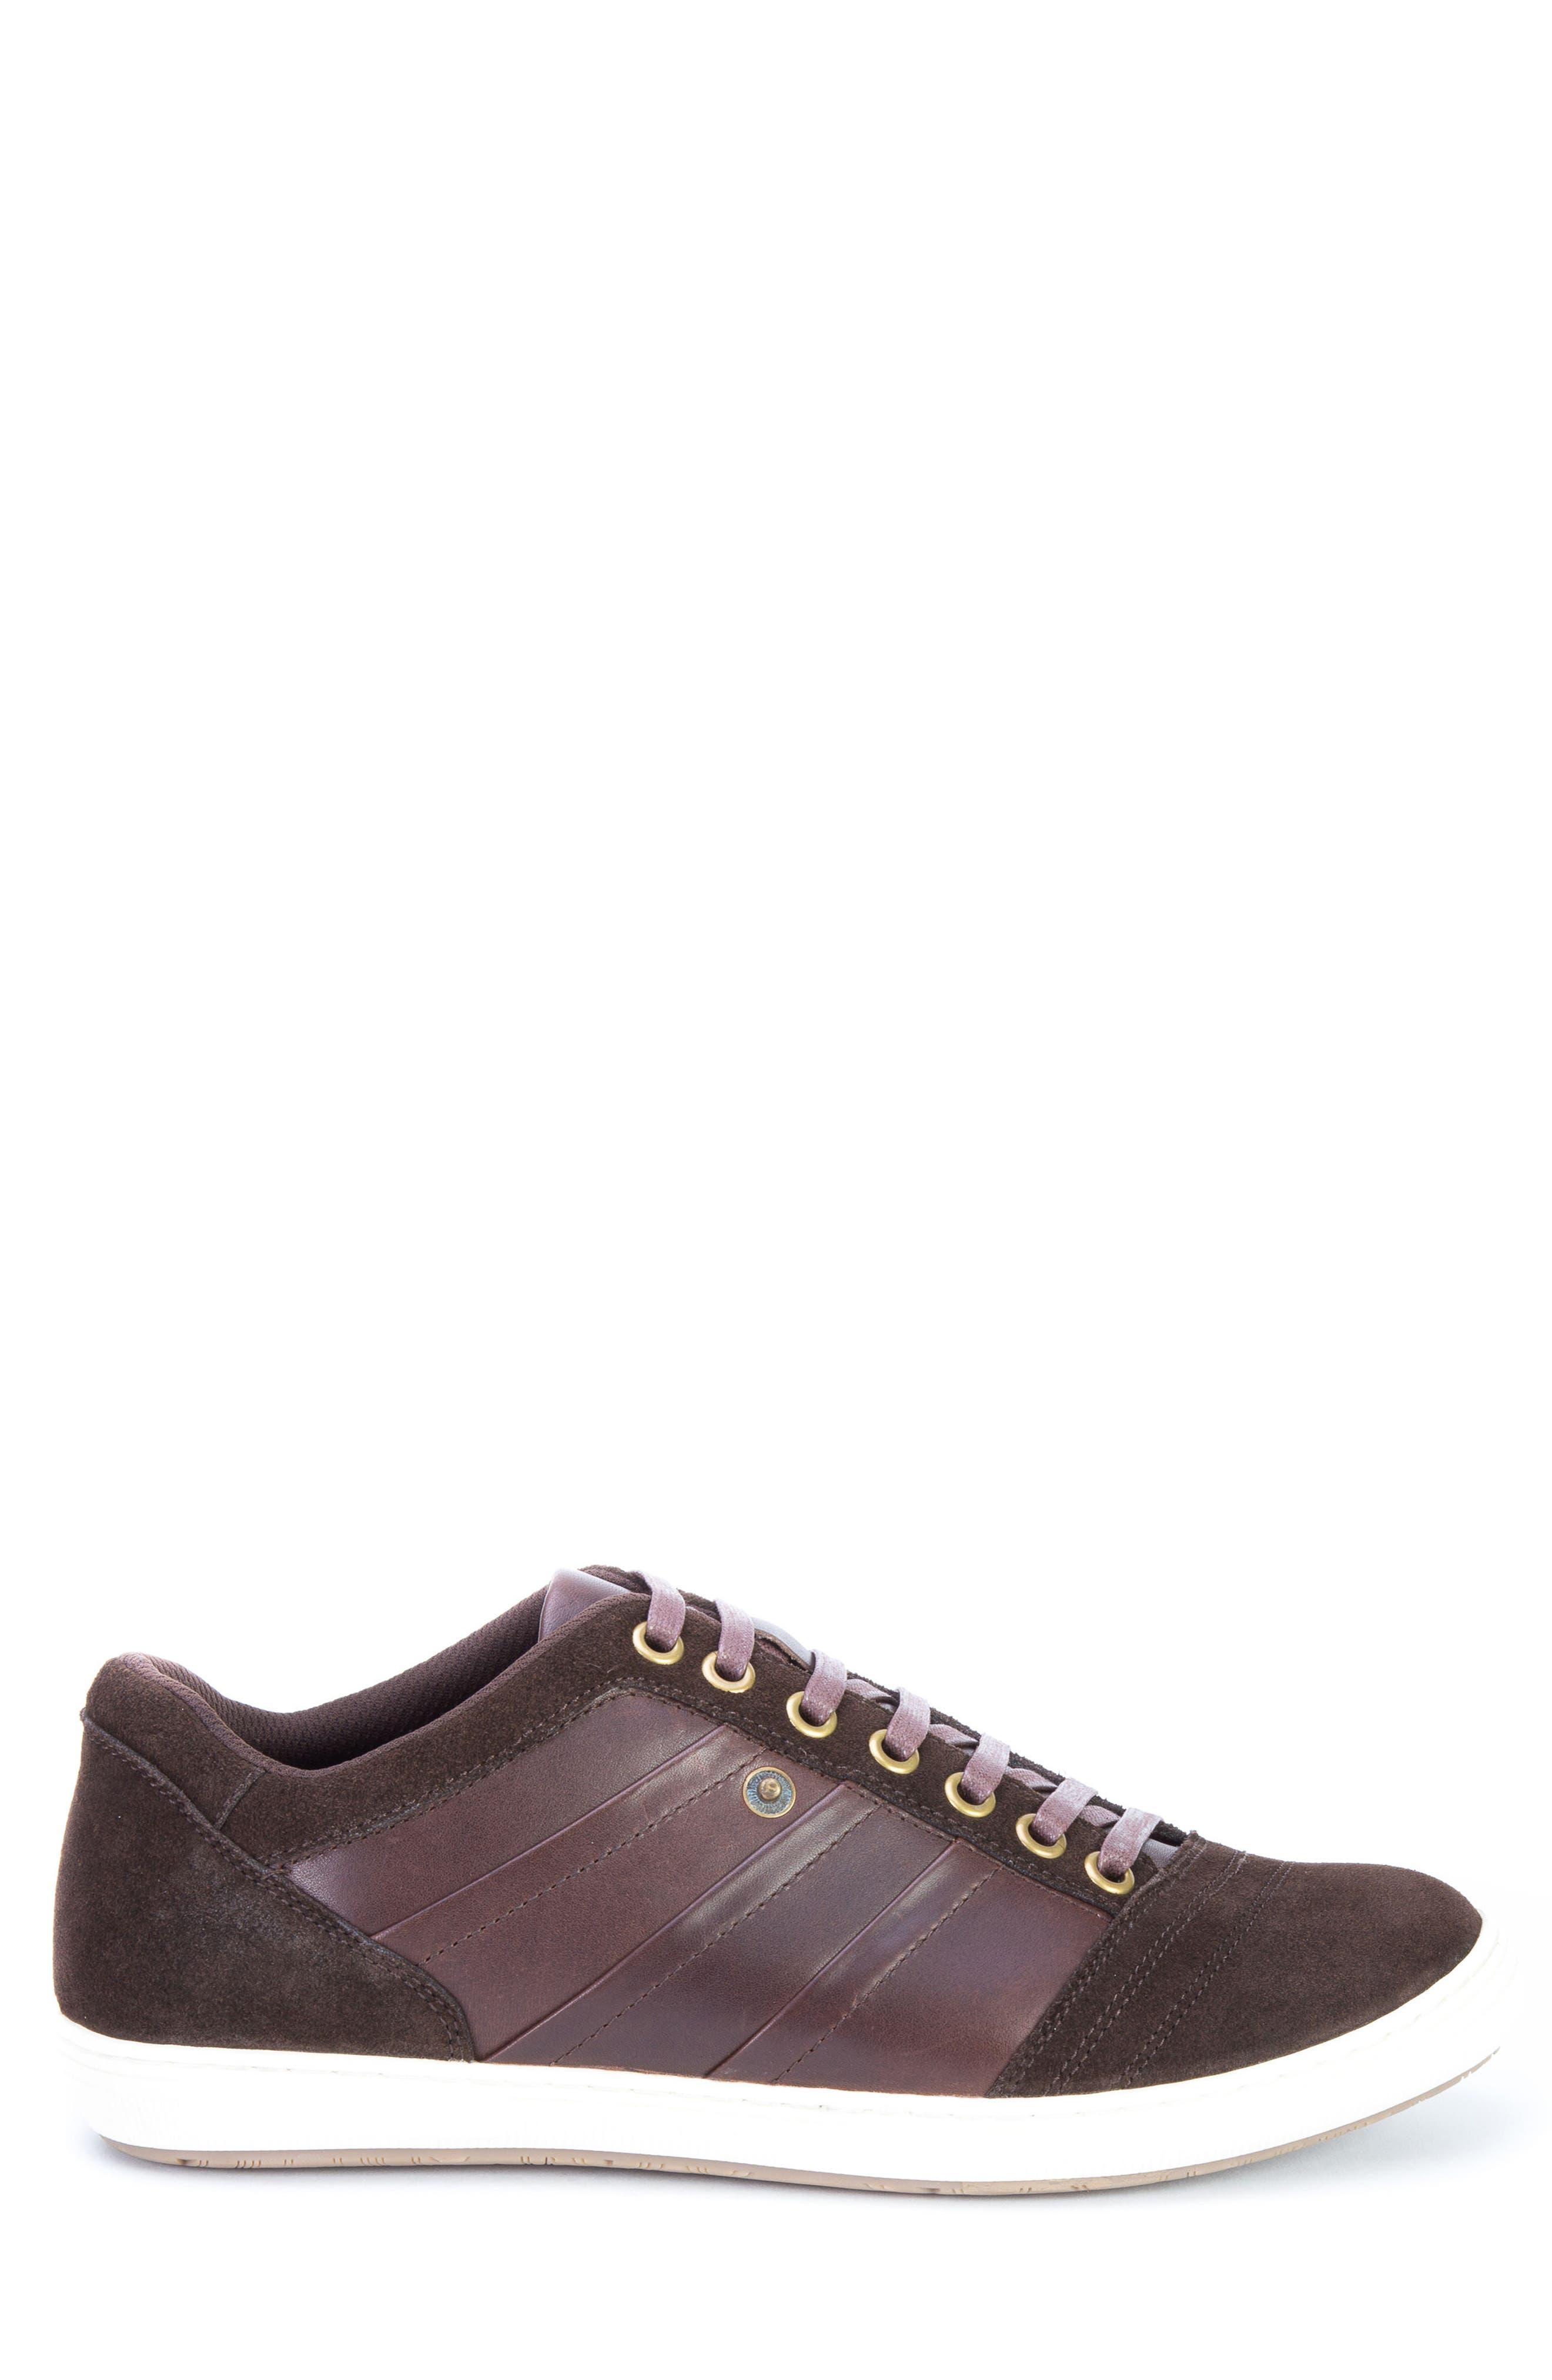 Alternate Image 3  - Zanzara Jive Sneaker (Men)